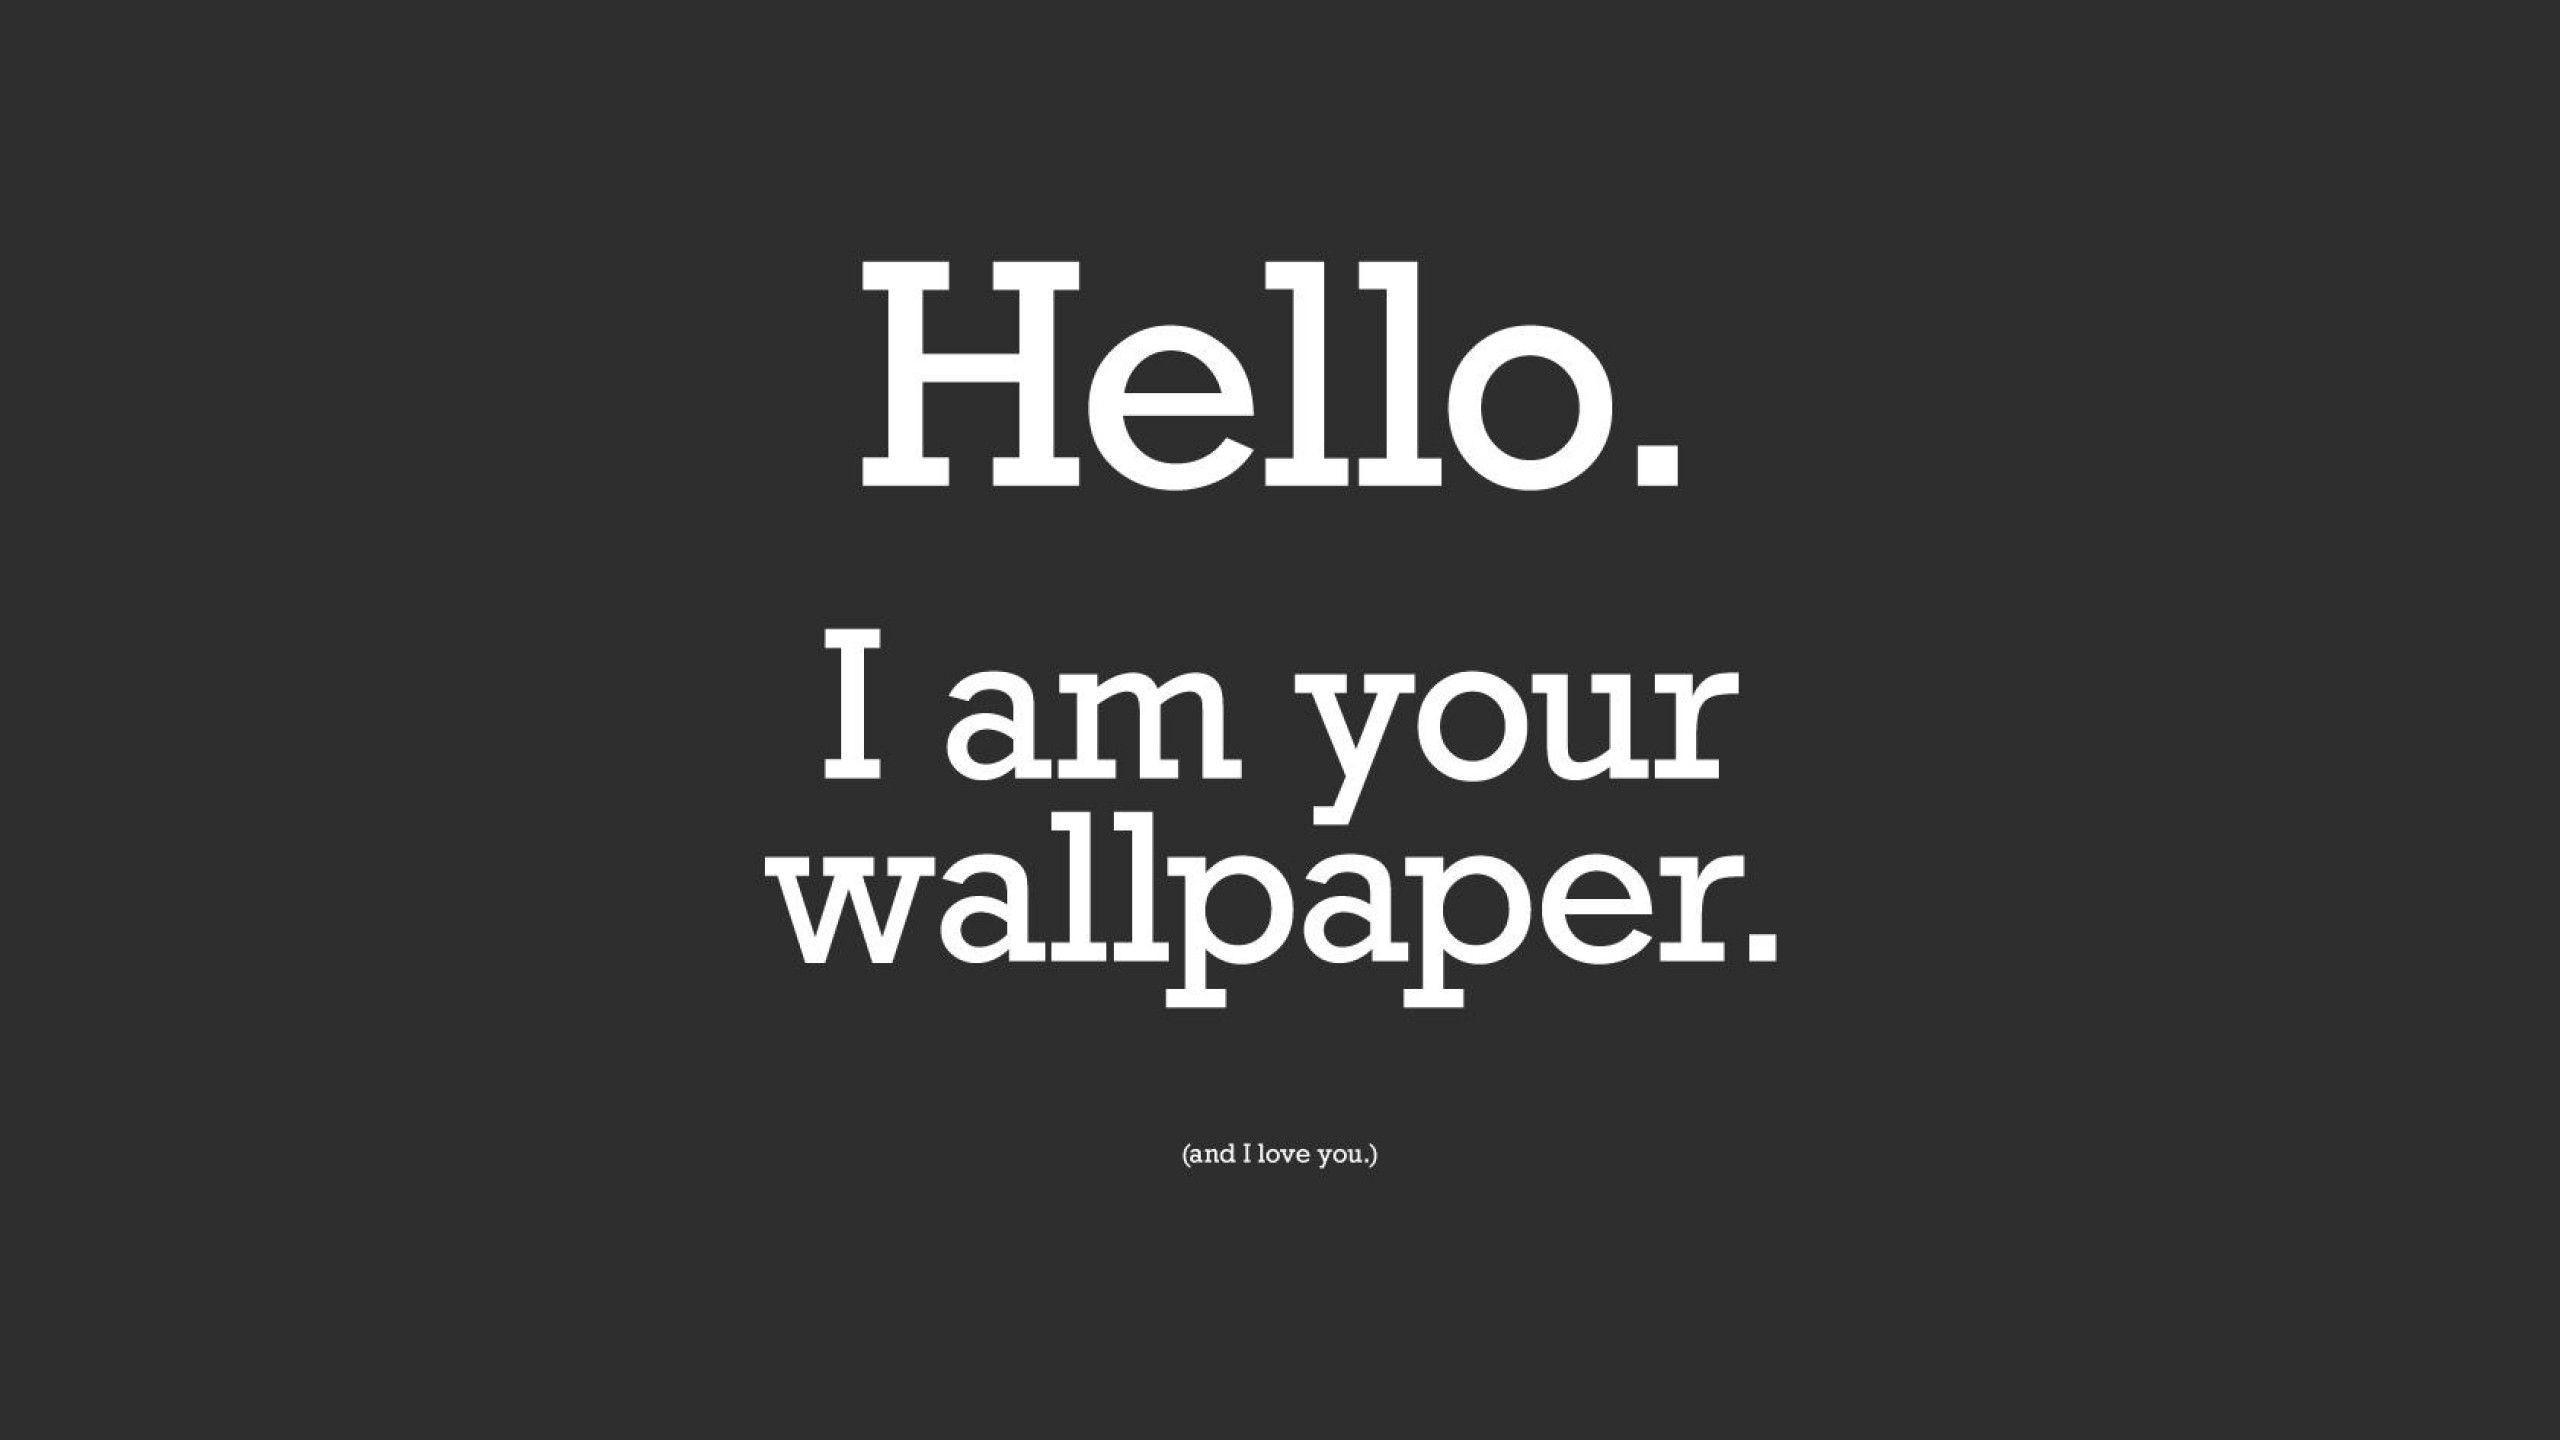 Quote Wallpaper for Desktop 59 images 2560x1440